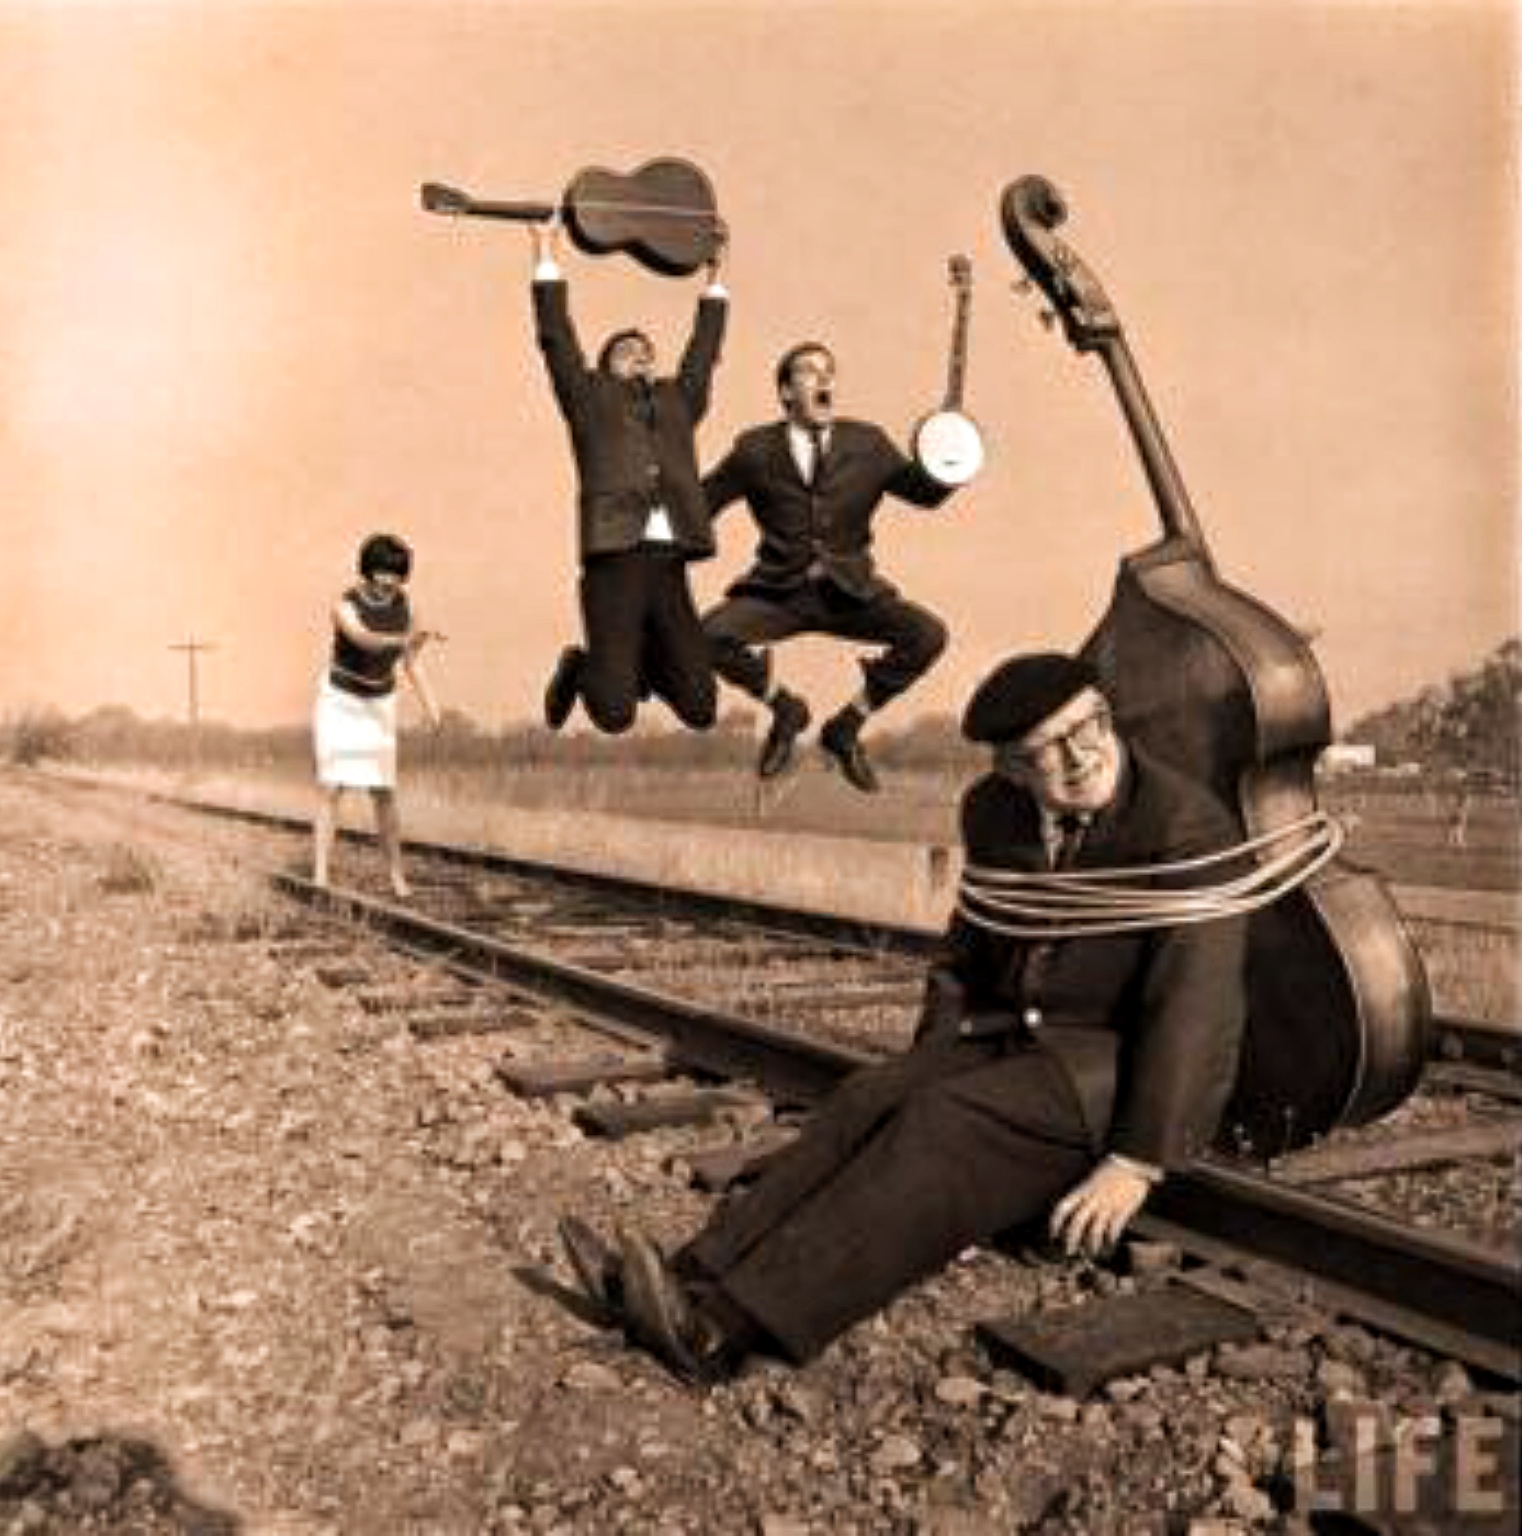 Cyrus Faryar, Judy Henske, Dave Guard, The Whiskeyhill Singers, and David Buck Wheat